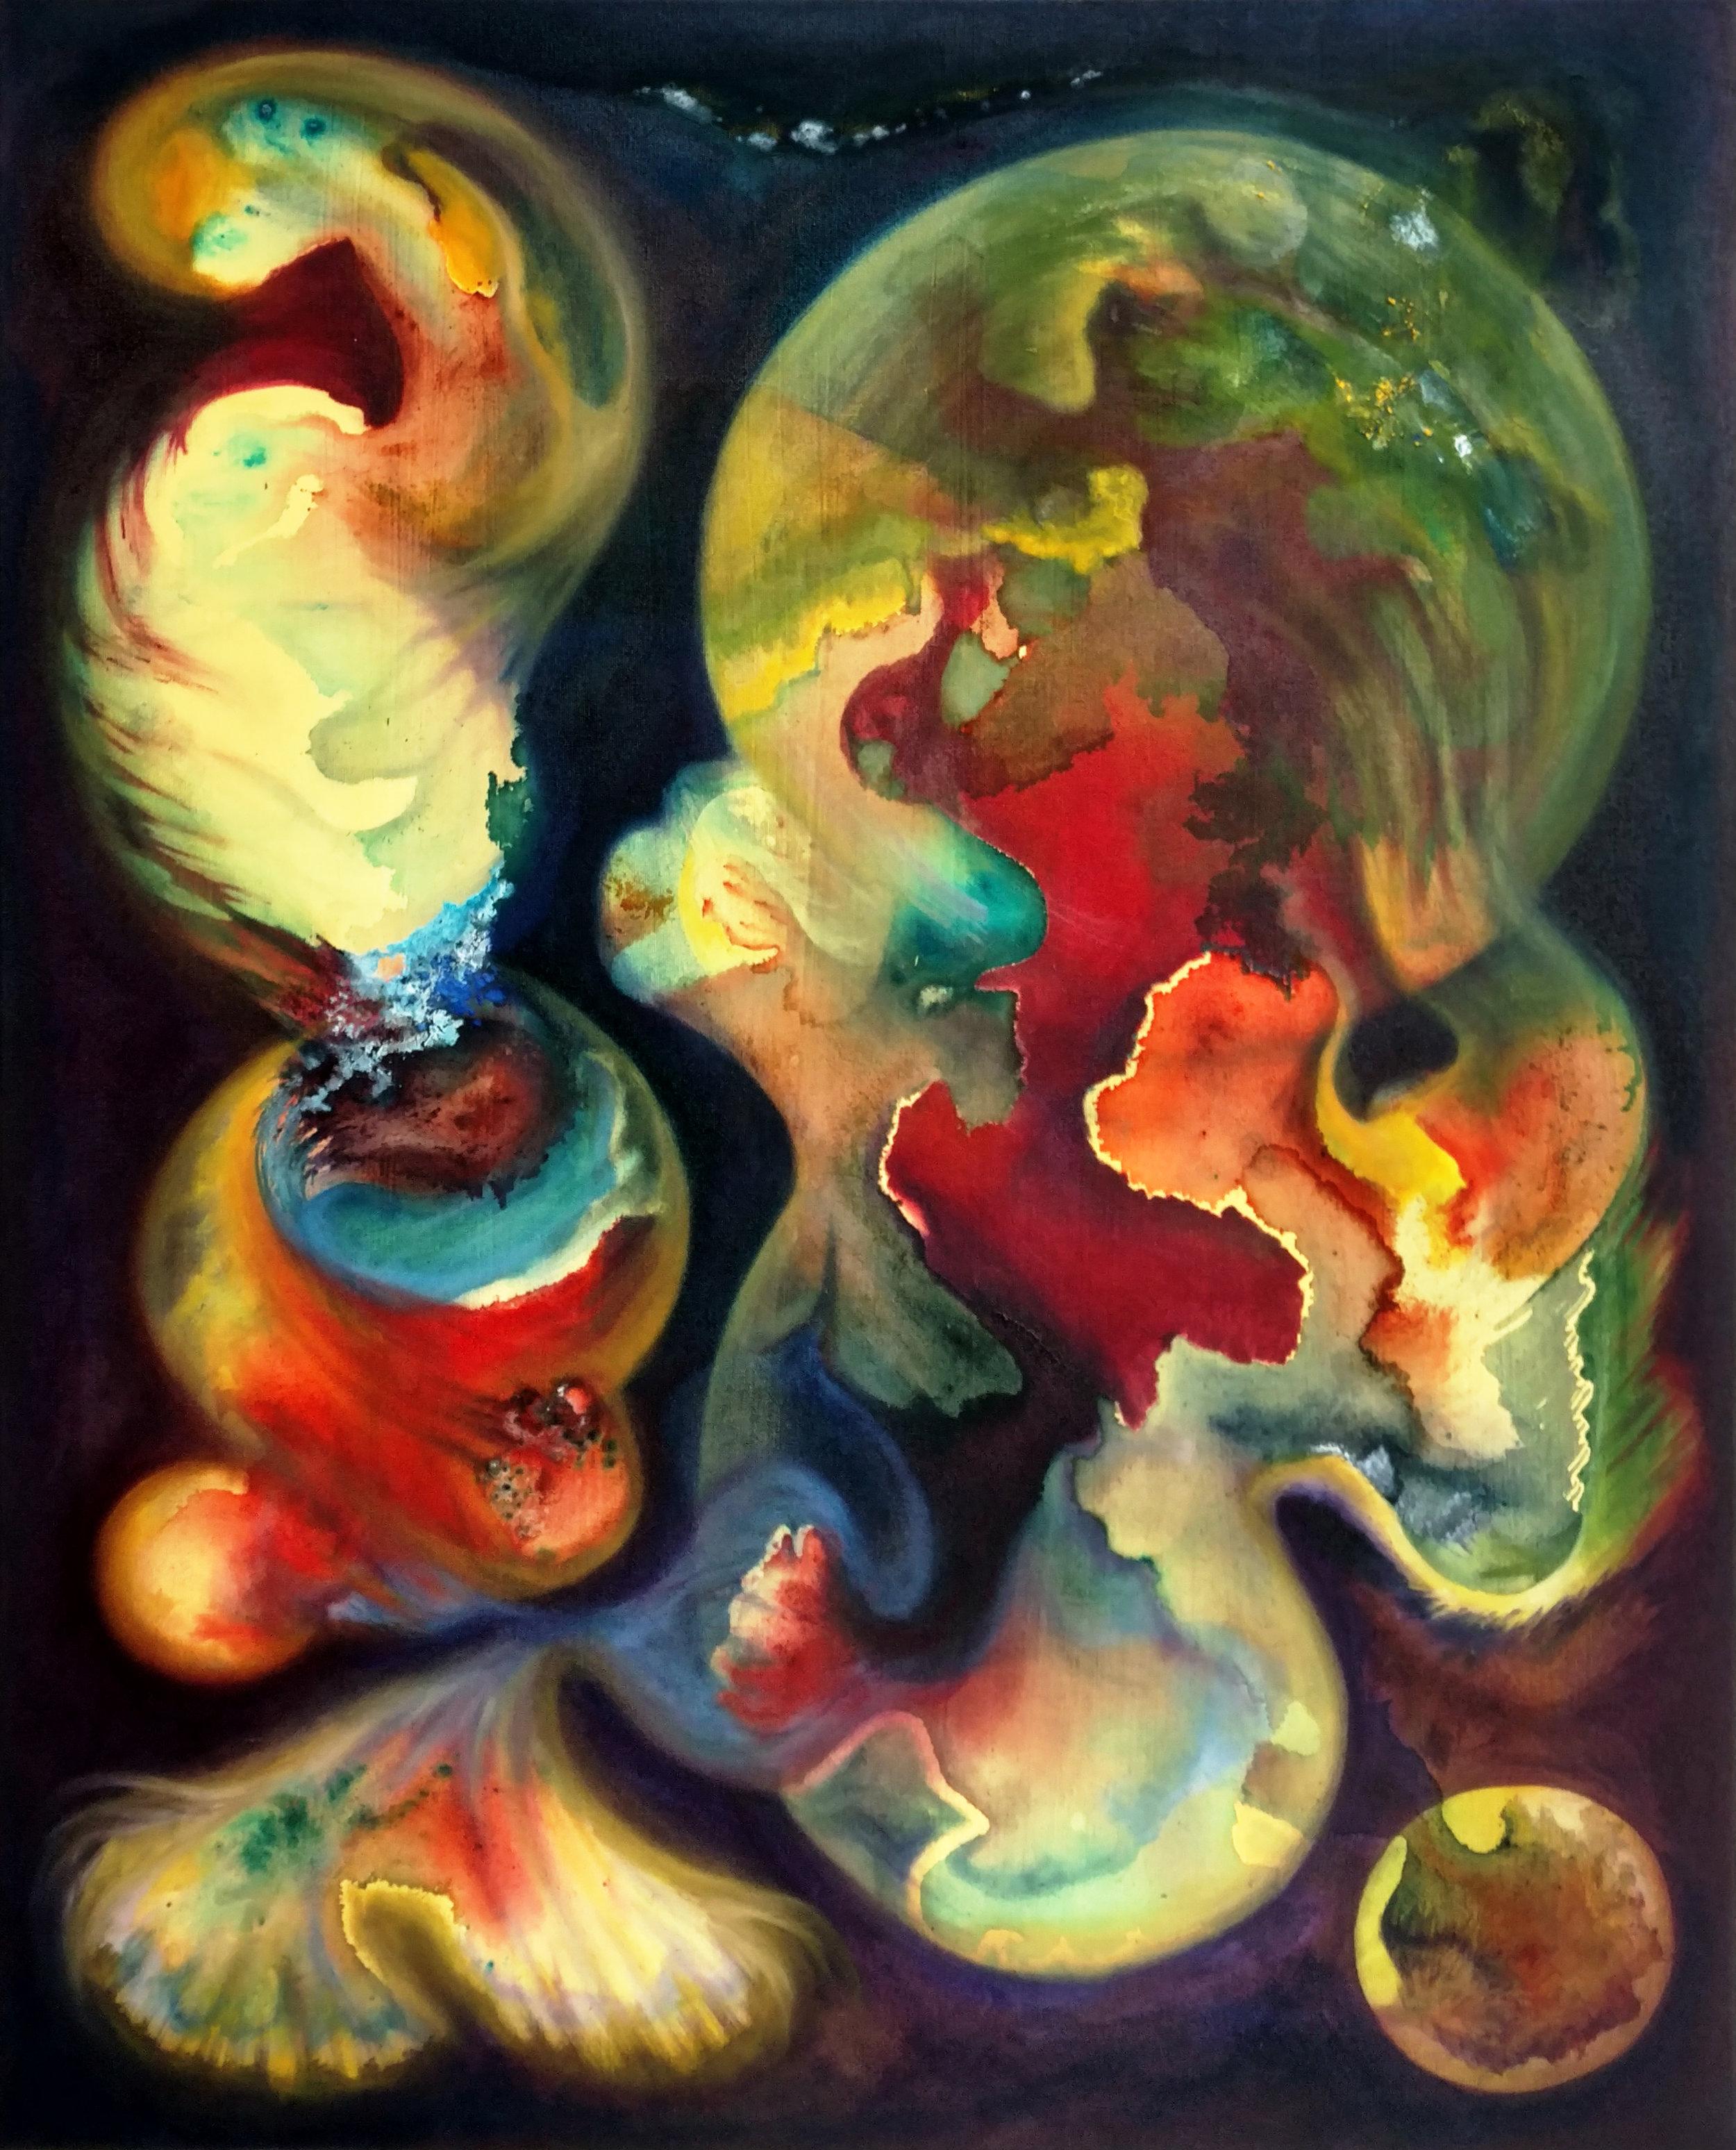 Universe,  2016. oil paint and sparkling wine on canvas, 81 x 100cm, Private collection, Paris, France